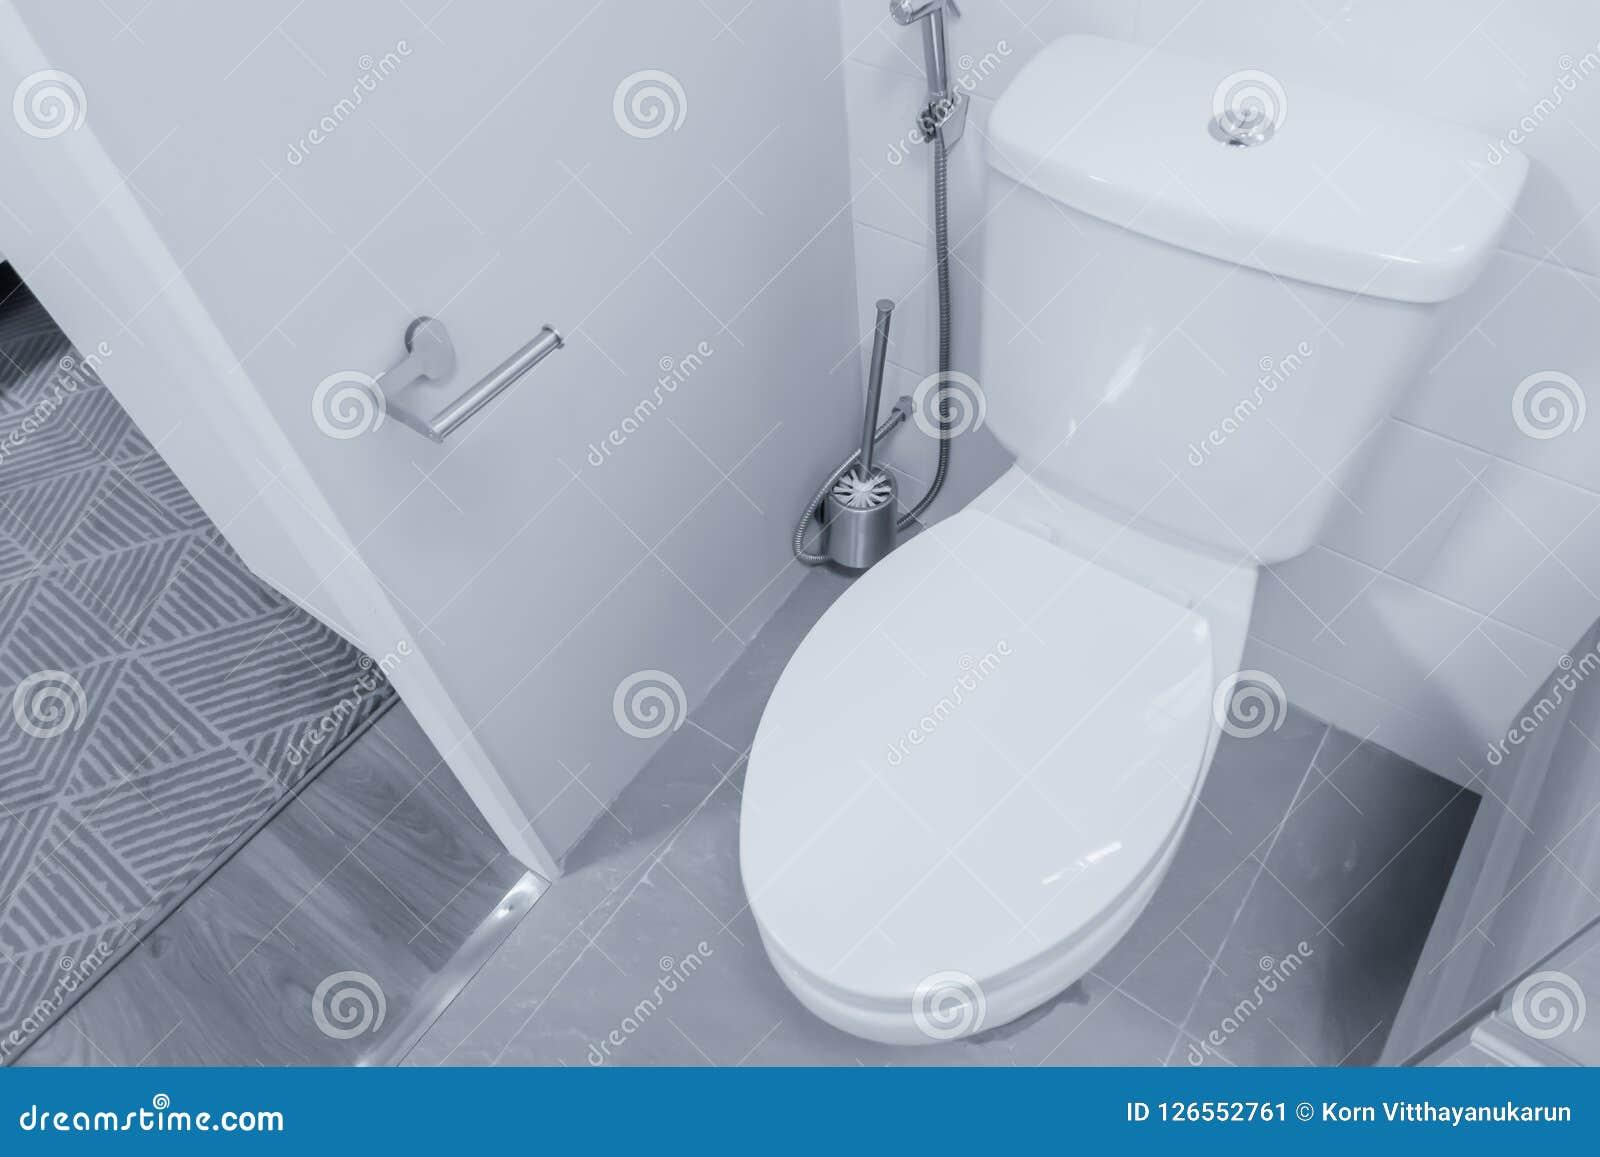 Clean Closet Bowl Flush Toilet Bidet Shower Stock Image Image Of